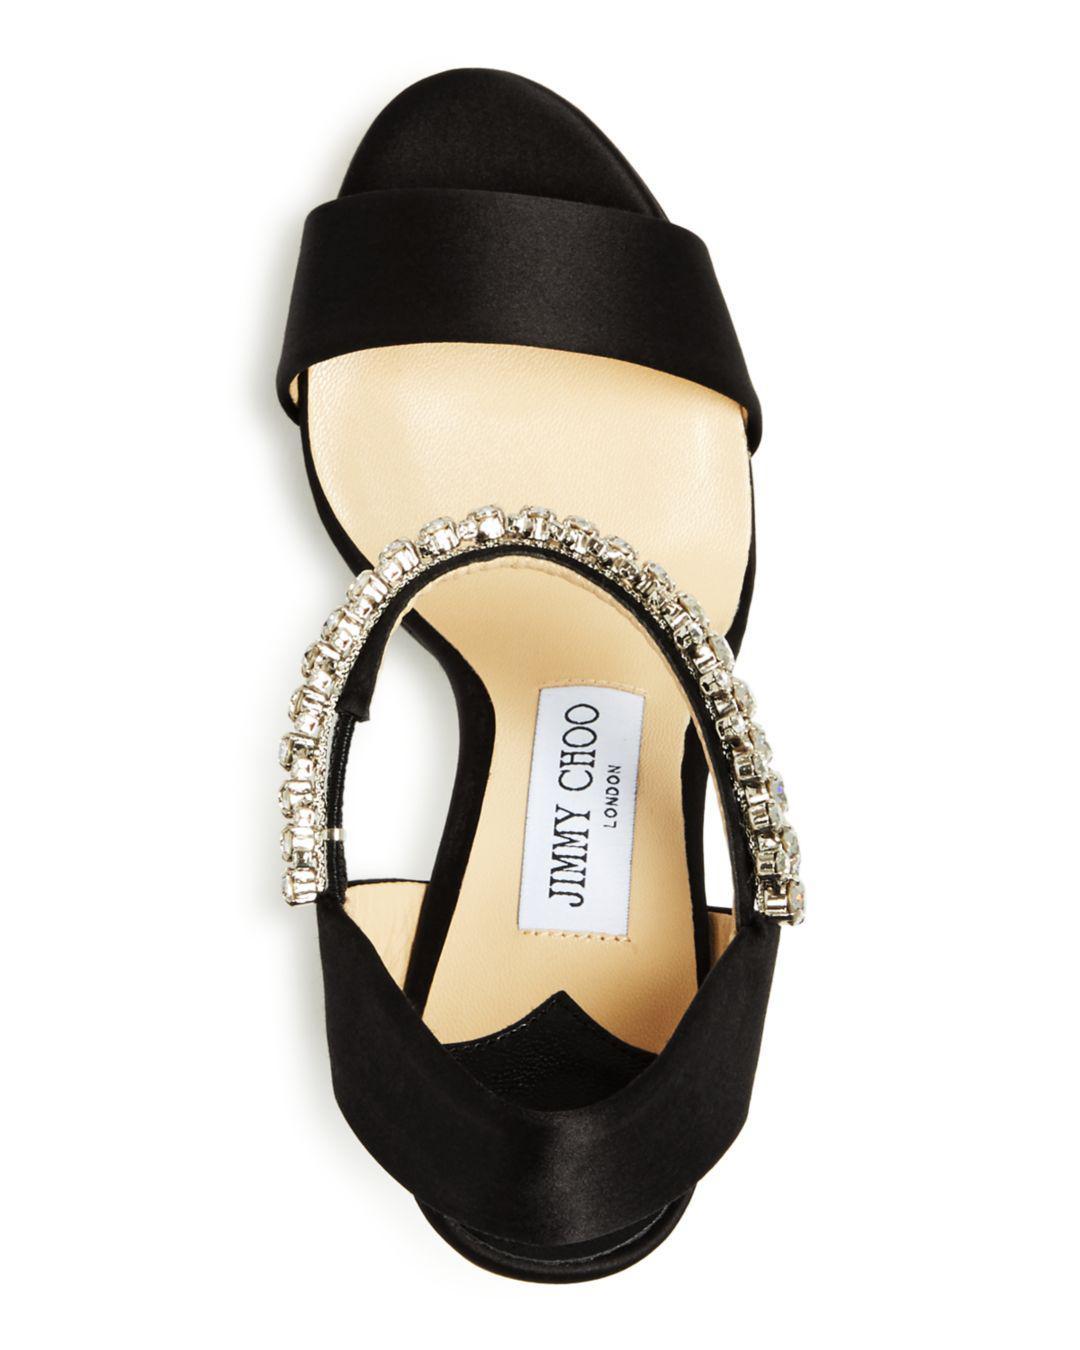 a70f3497467 Jimmy Choo - Black Women s Santina 125 Embellished High Block-heel Platform  Sandals - Lyst. View fullscreen